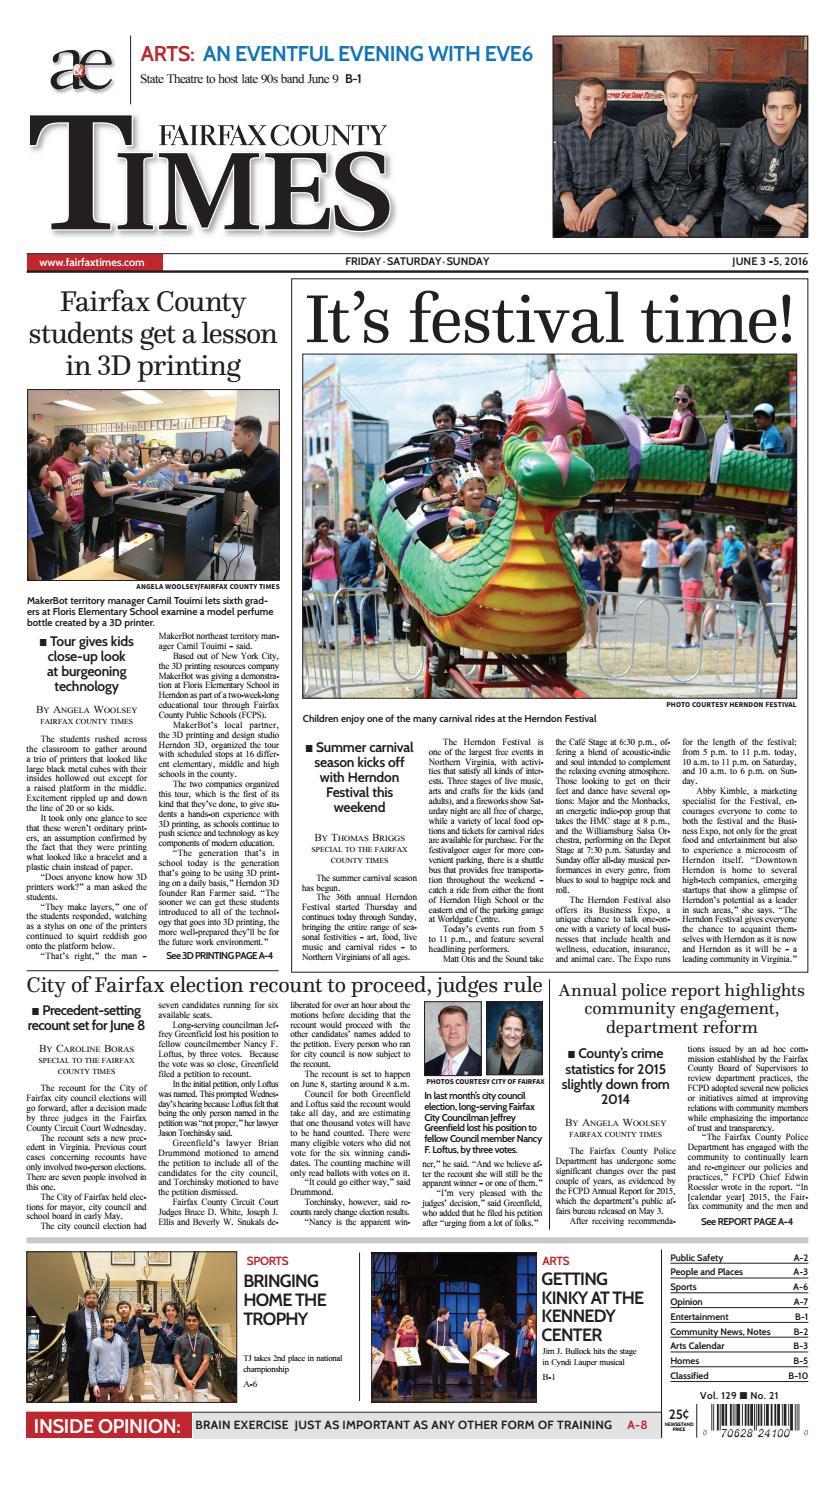 Fairfax County Times 06/03/16 by The Fairfax Times - Issuu